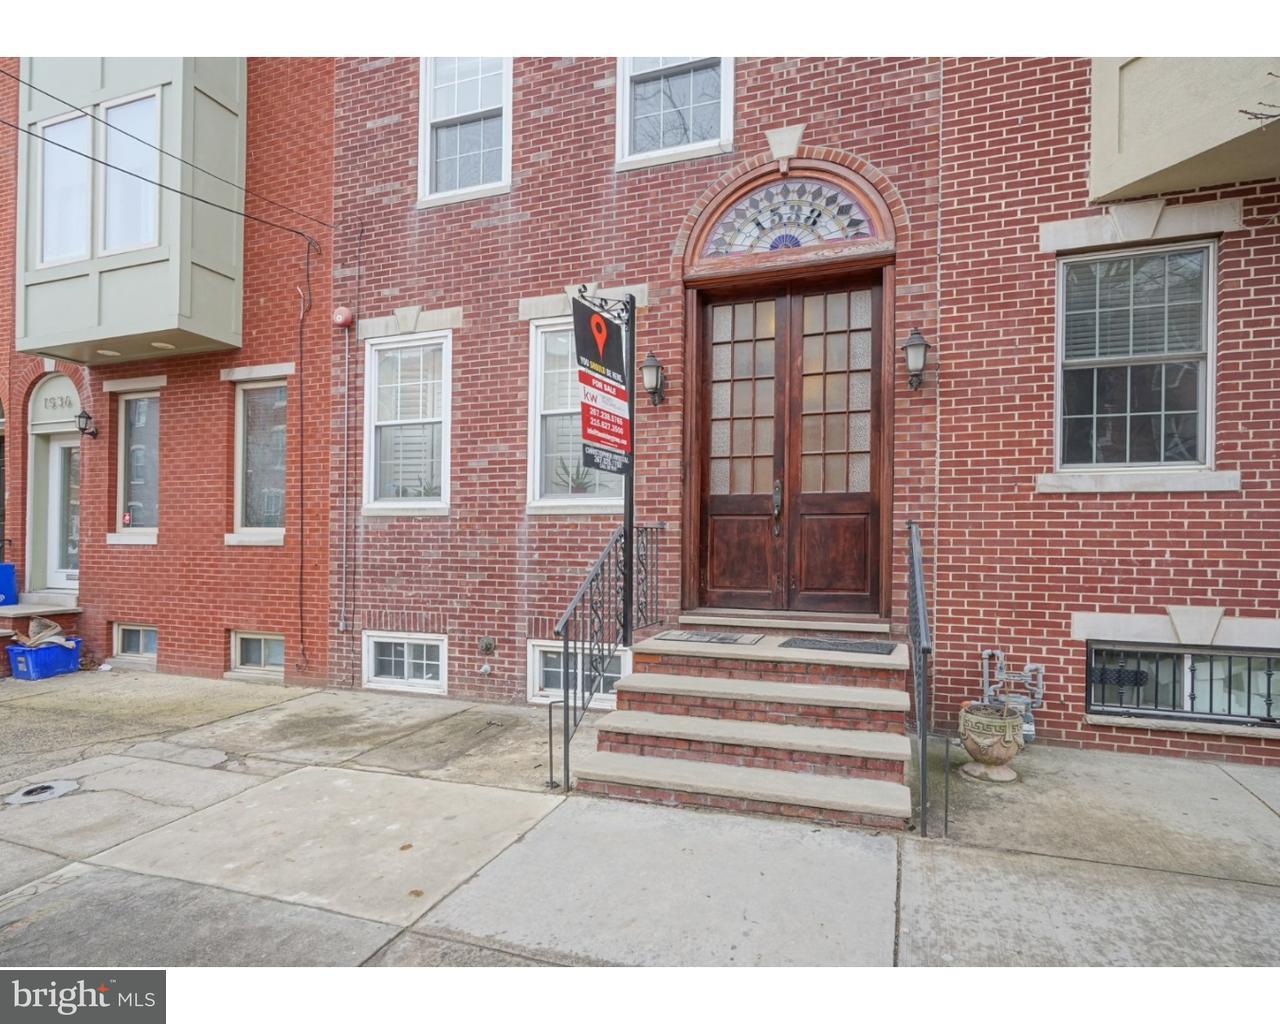 1538 Christian Street #1 Philadelphia, PA 19146